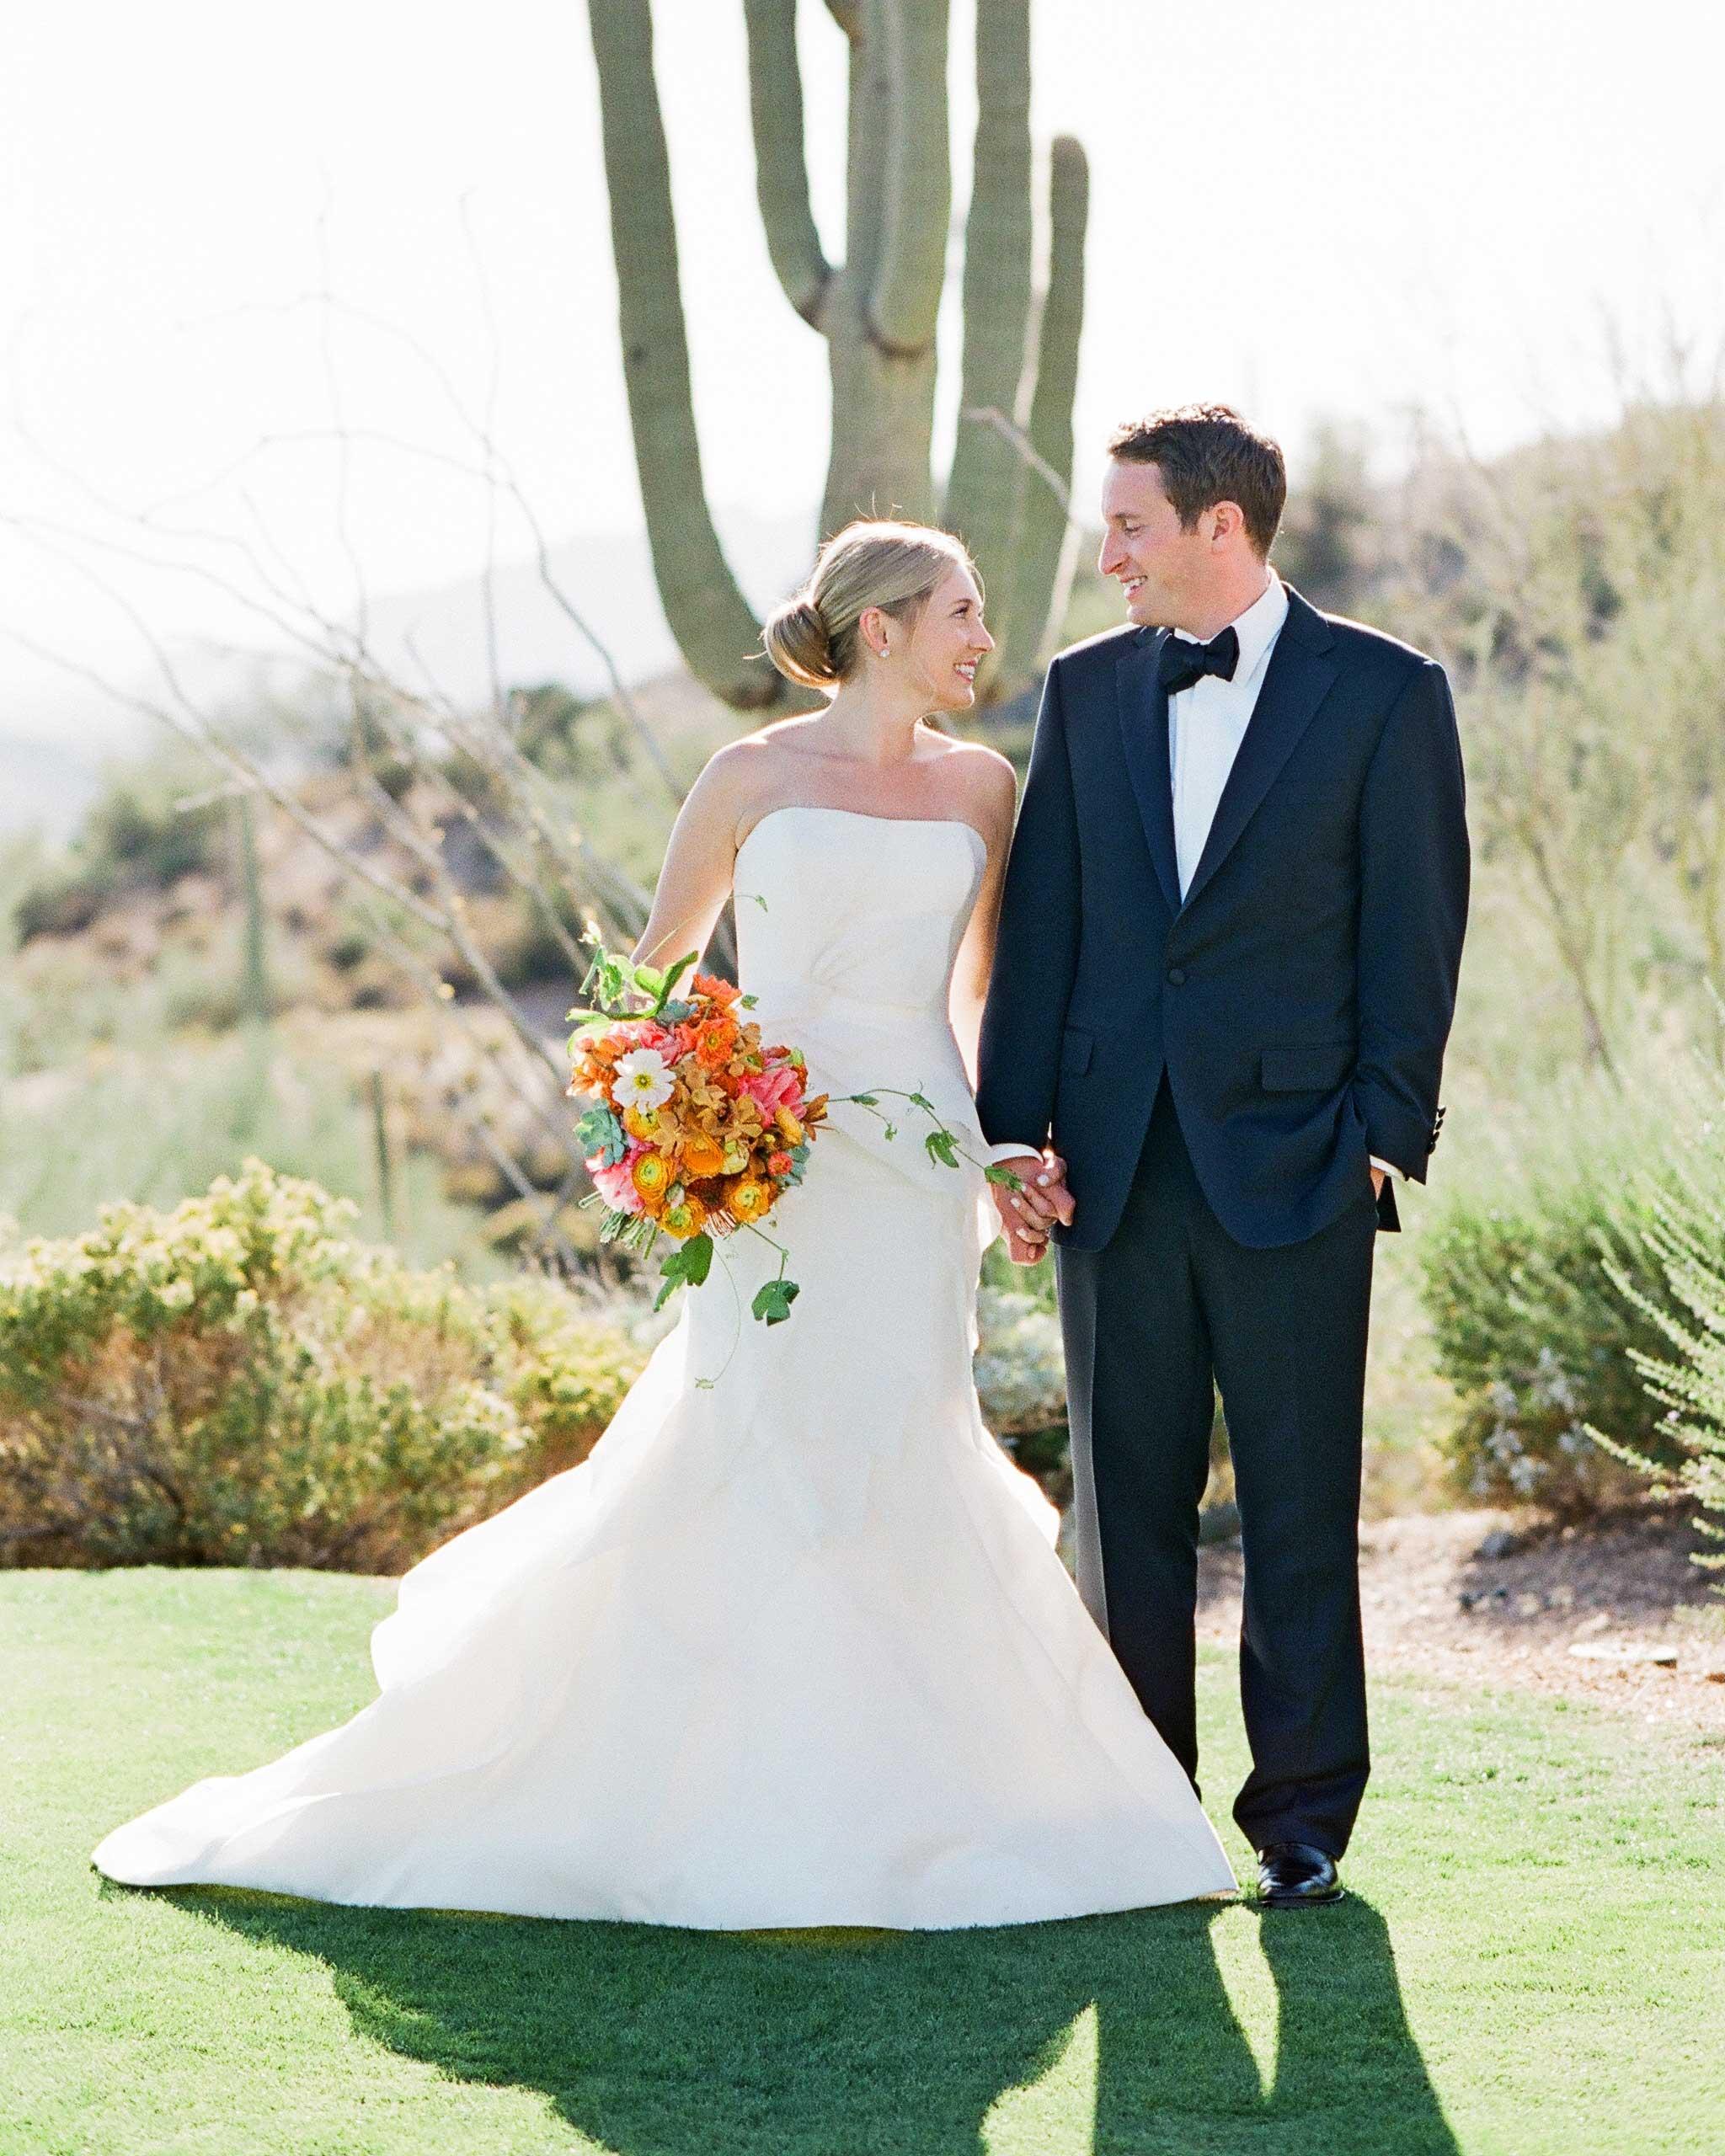 addie alex wedding couple cactus